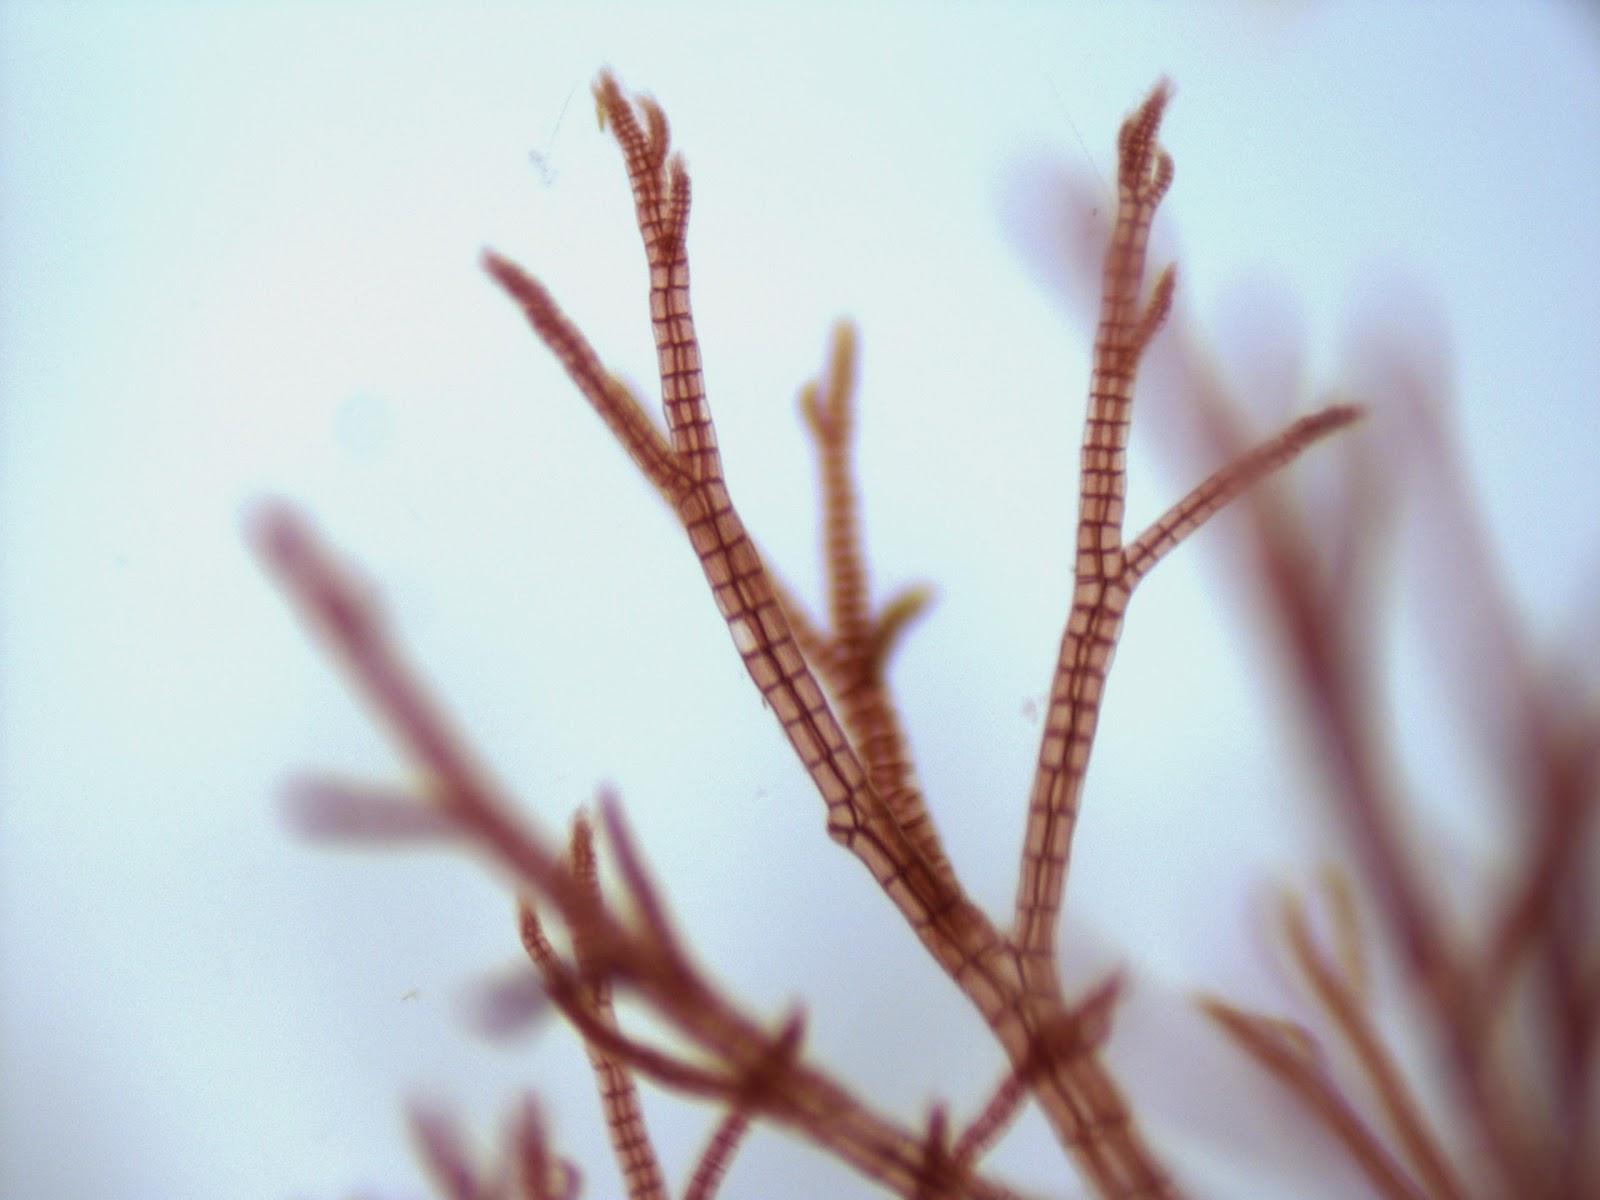 Harbor Watch: Branching Bryozoa and Red Algae  Harbor Watch: B...